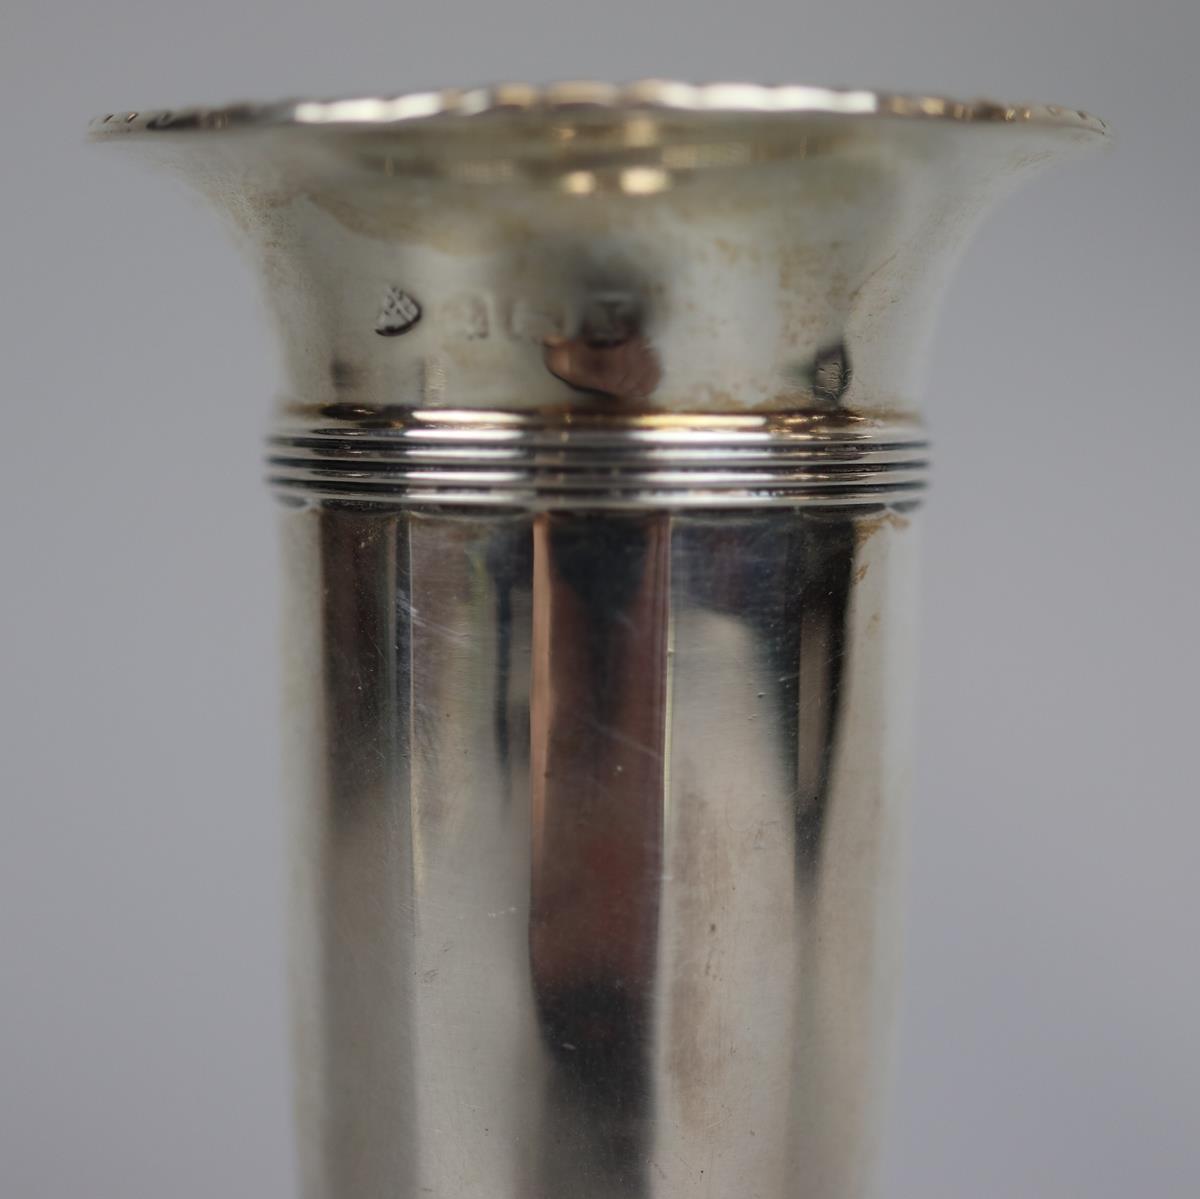 Hallmarked silver Posey vase - Adie Brothers Ltd - 1922 - H: 12.5cm - Image 2 of 4